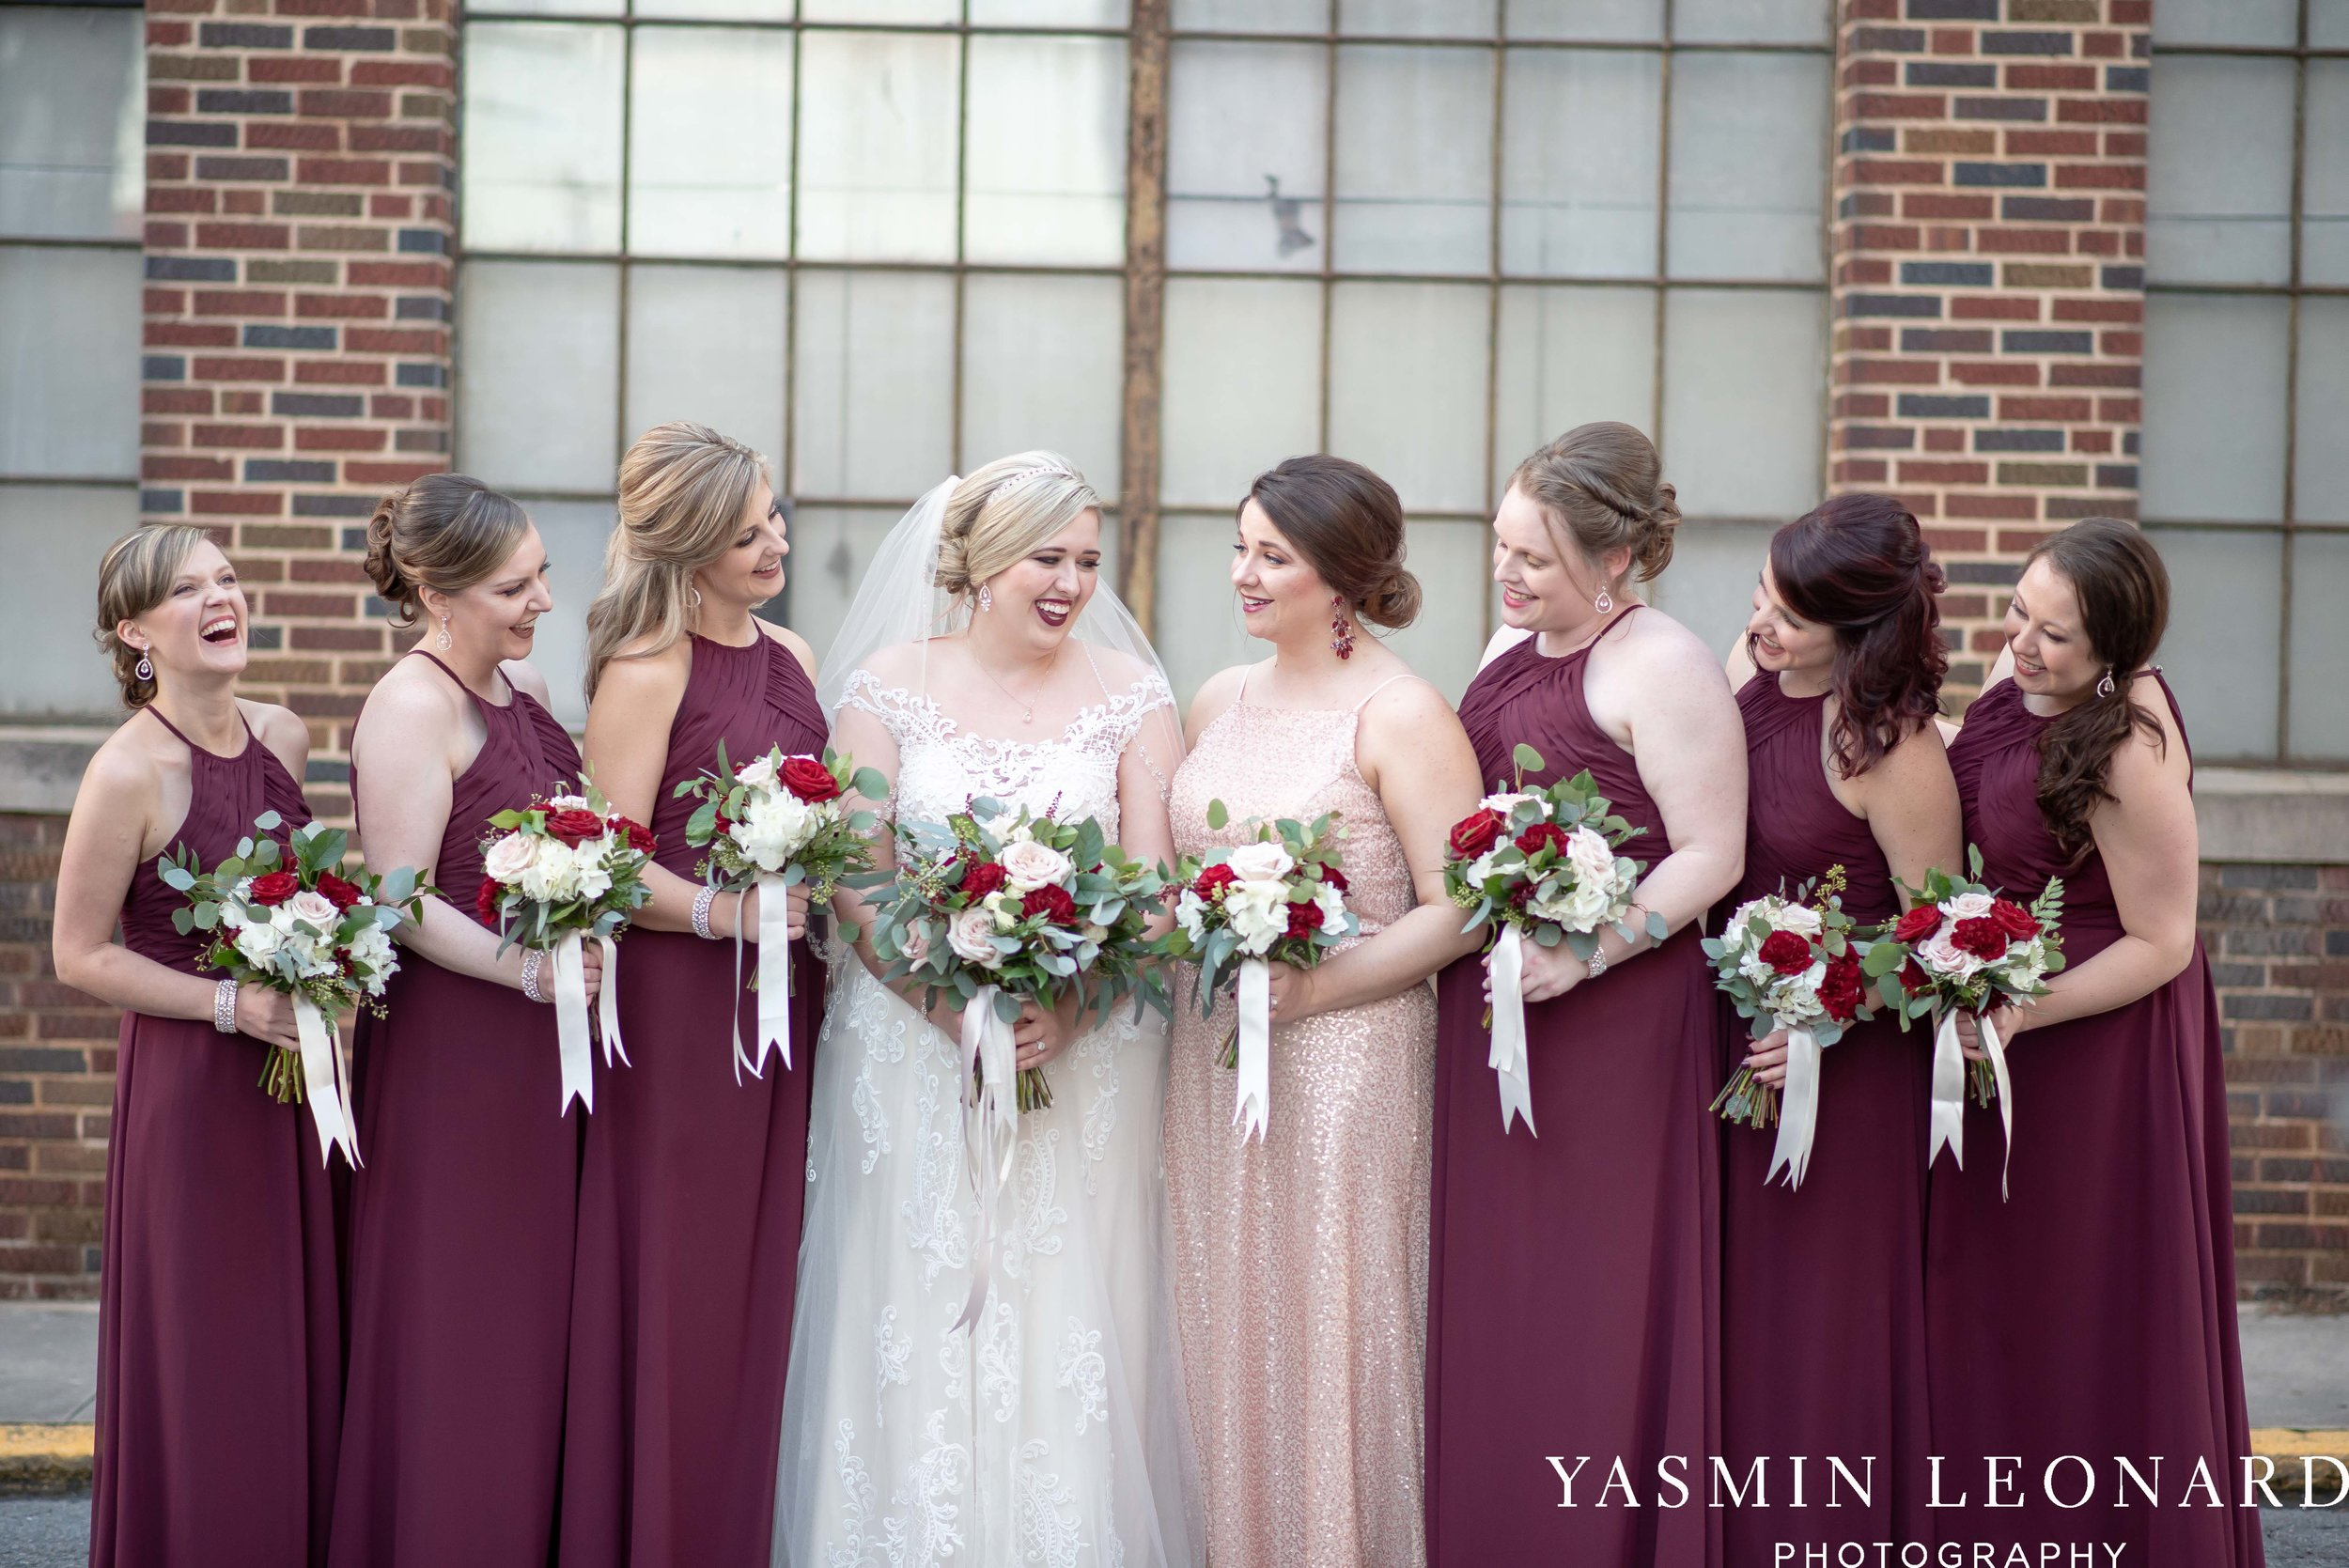 Rebekah and Matt - 105 Worth Event Centre - Yasmin Leonard Photography - Asheboro Wedding - NC Wedding - High Point Weddings - Triad Weddings - Winter Wedding-7.jpg